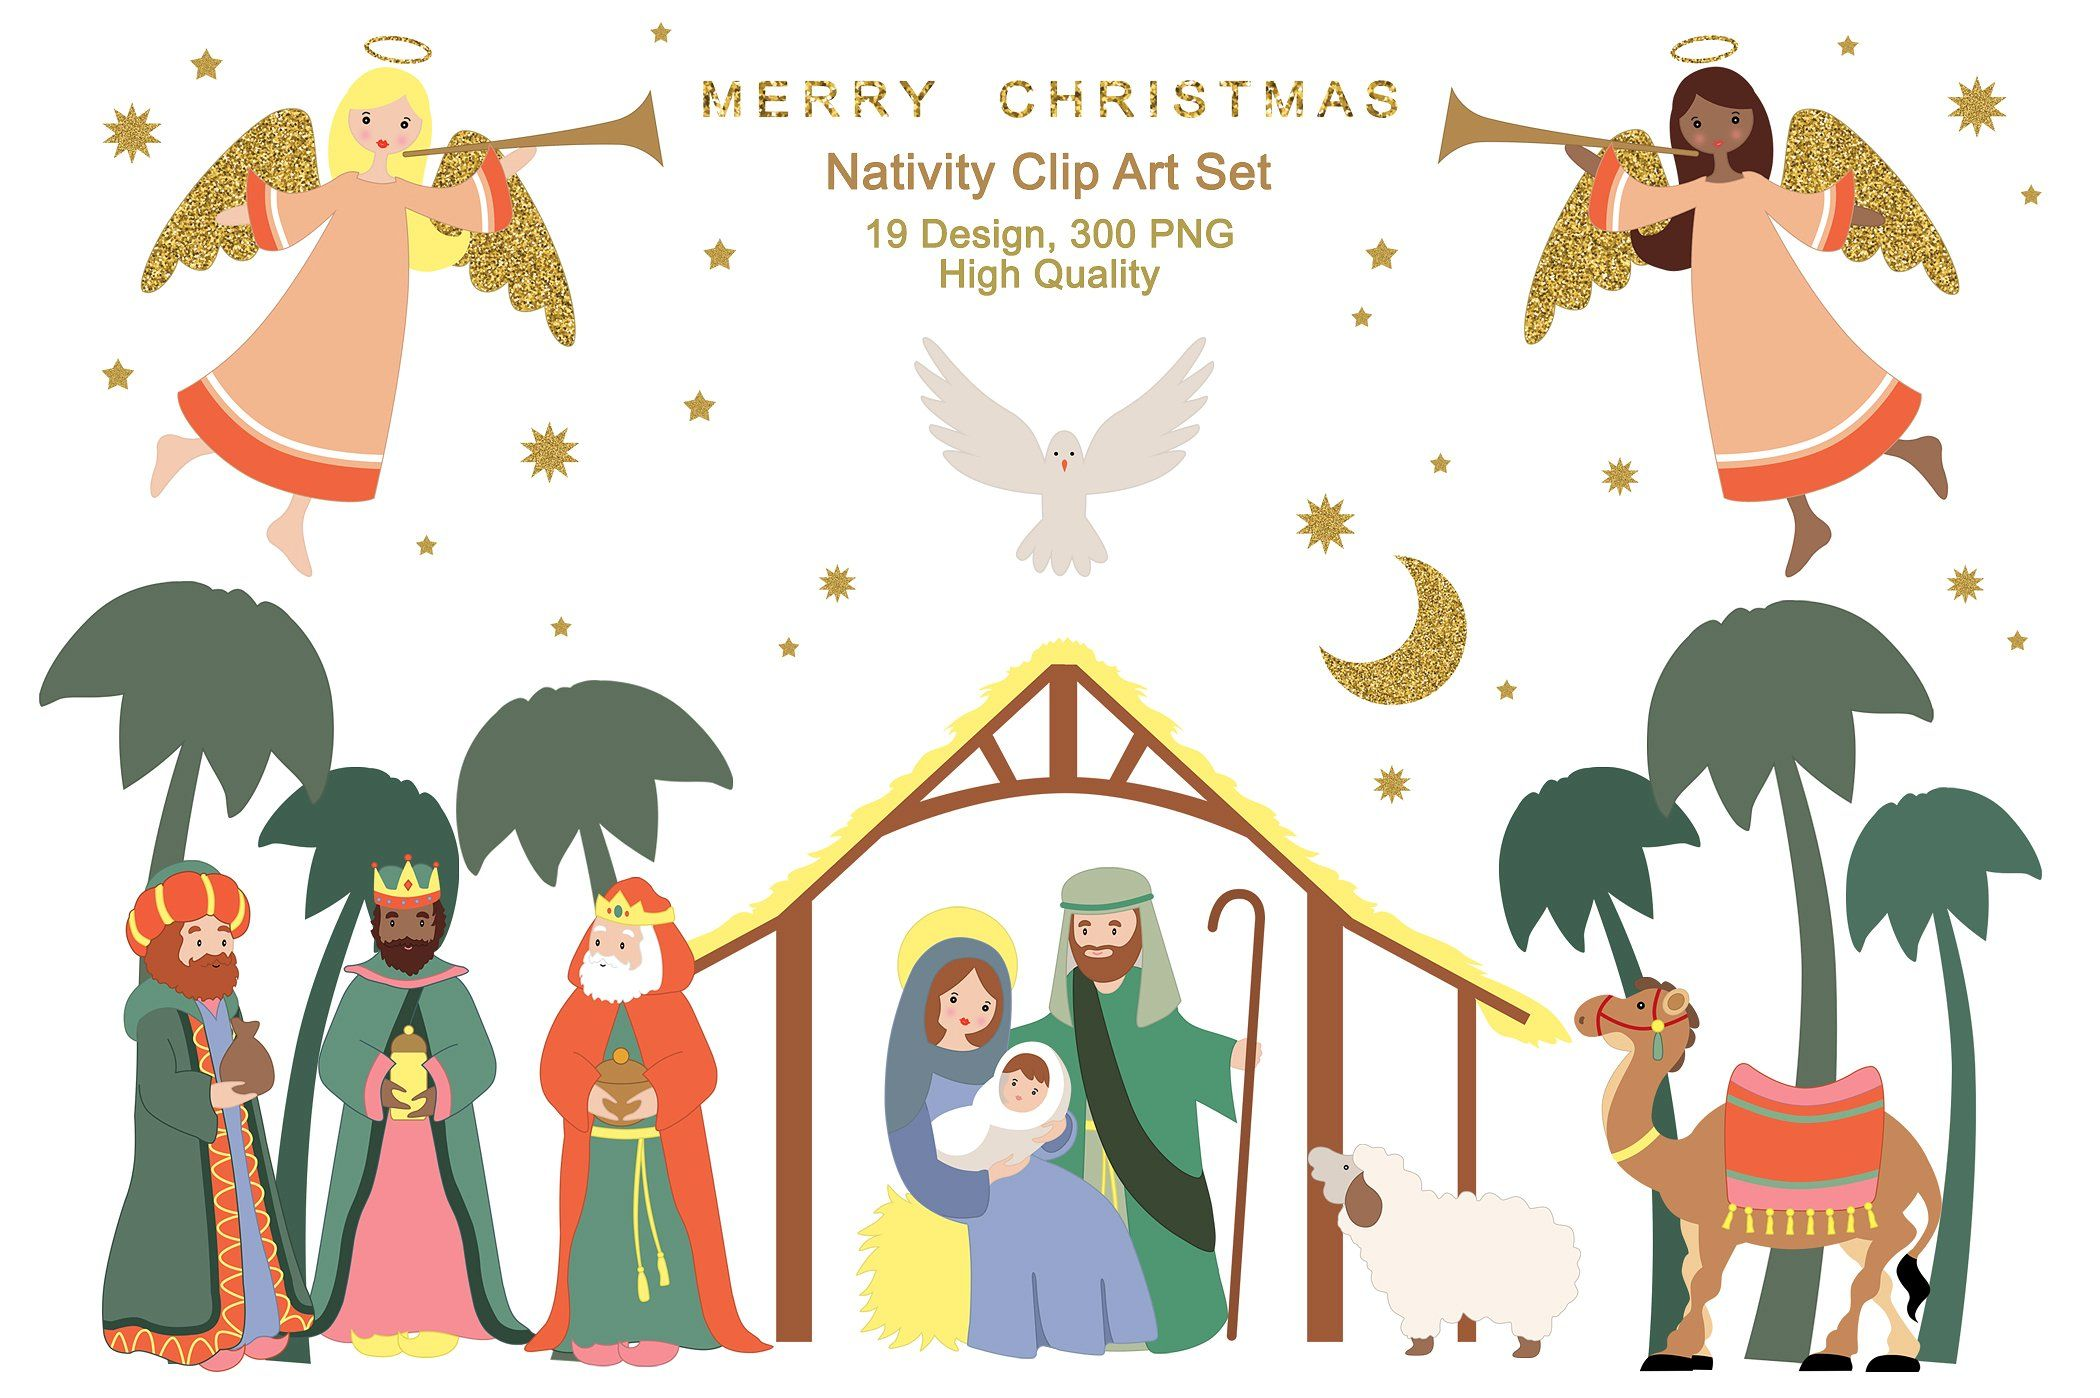 nativity birth of jesus christmas nativity christmas jesus christmas clipart nativity birth of jesus christmas